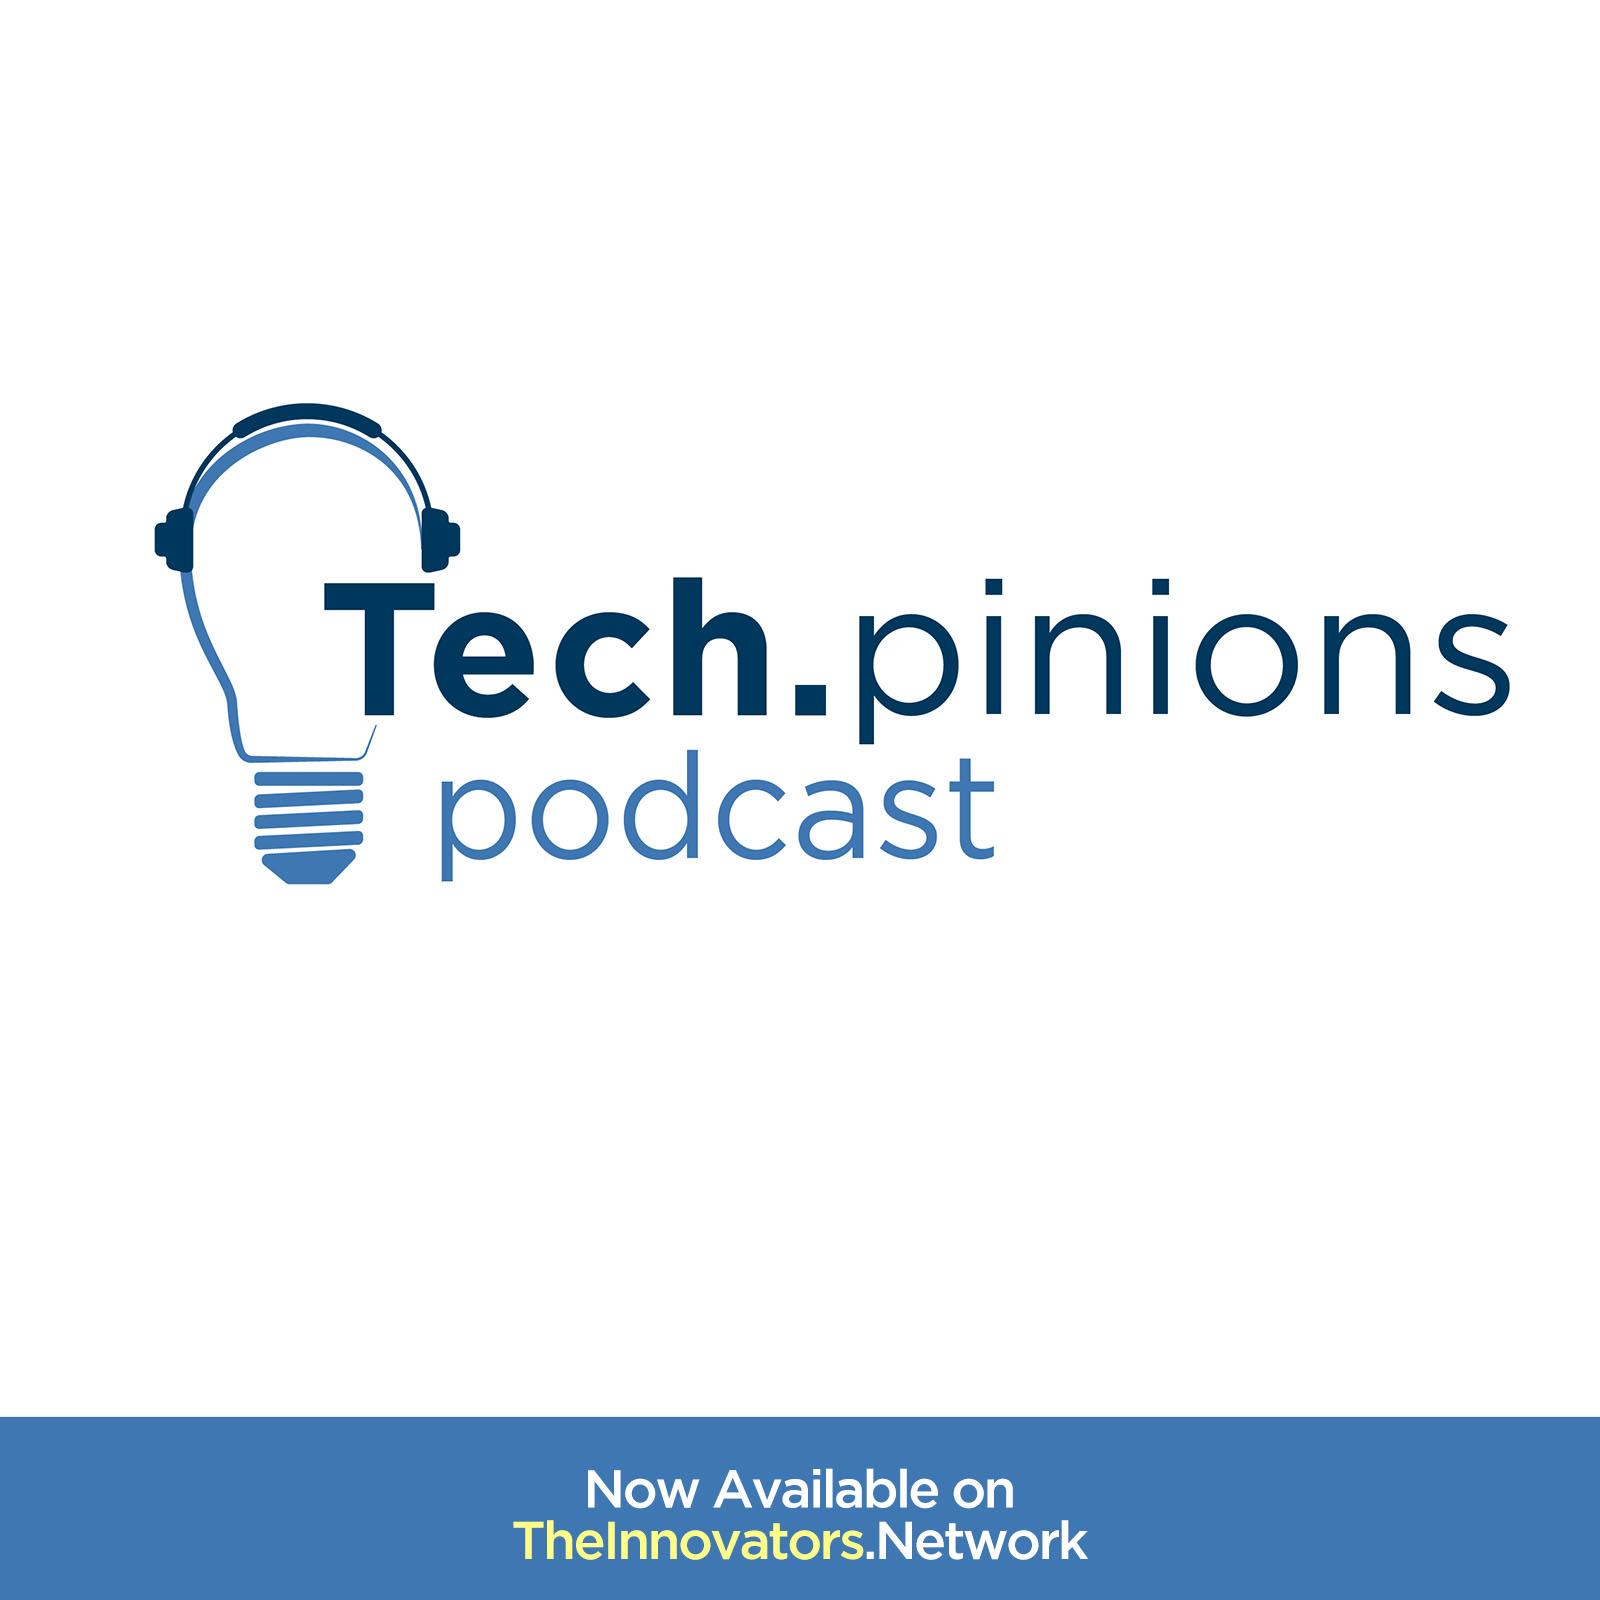 techpinions podcast logo